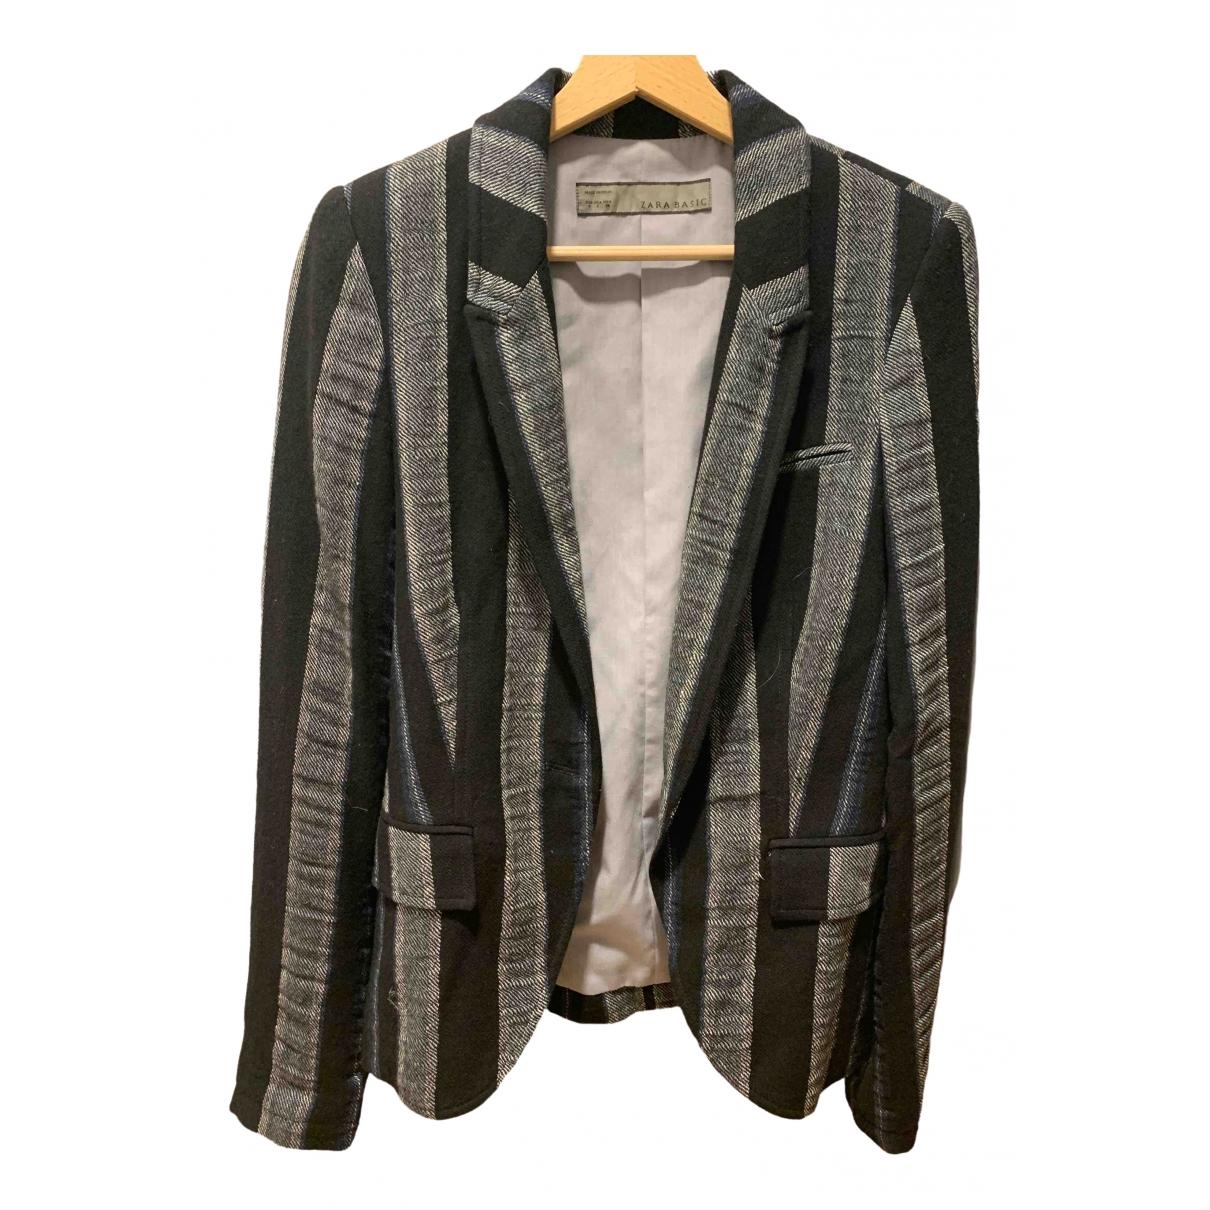 Zara \N Jacke in  Bunt Polyester